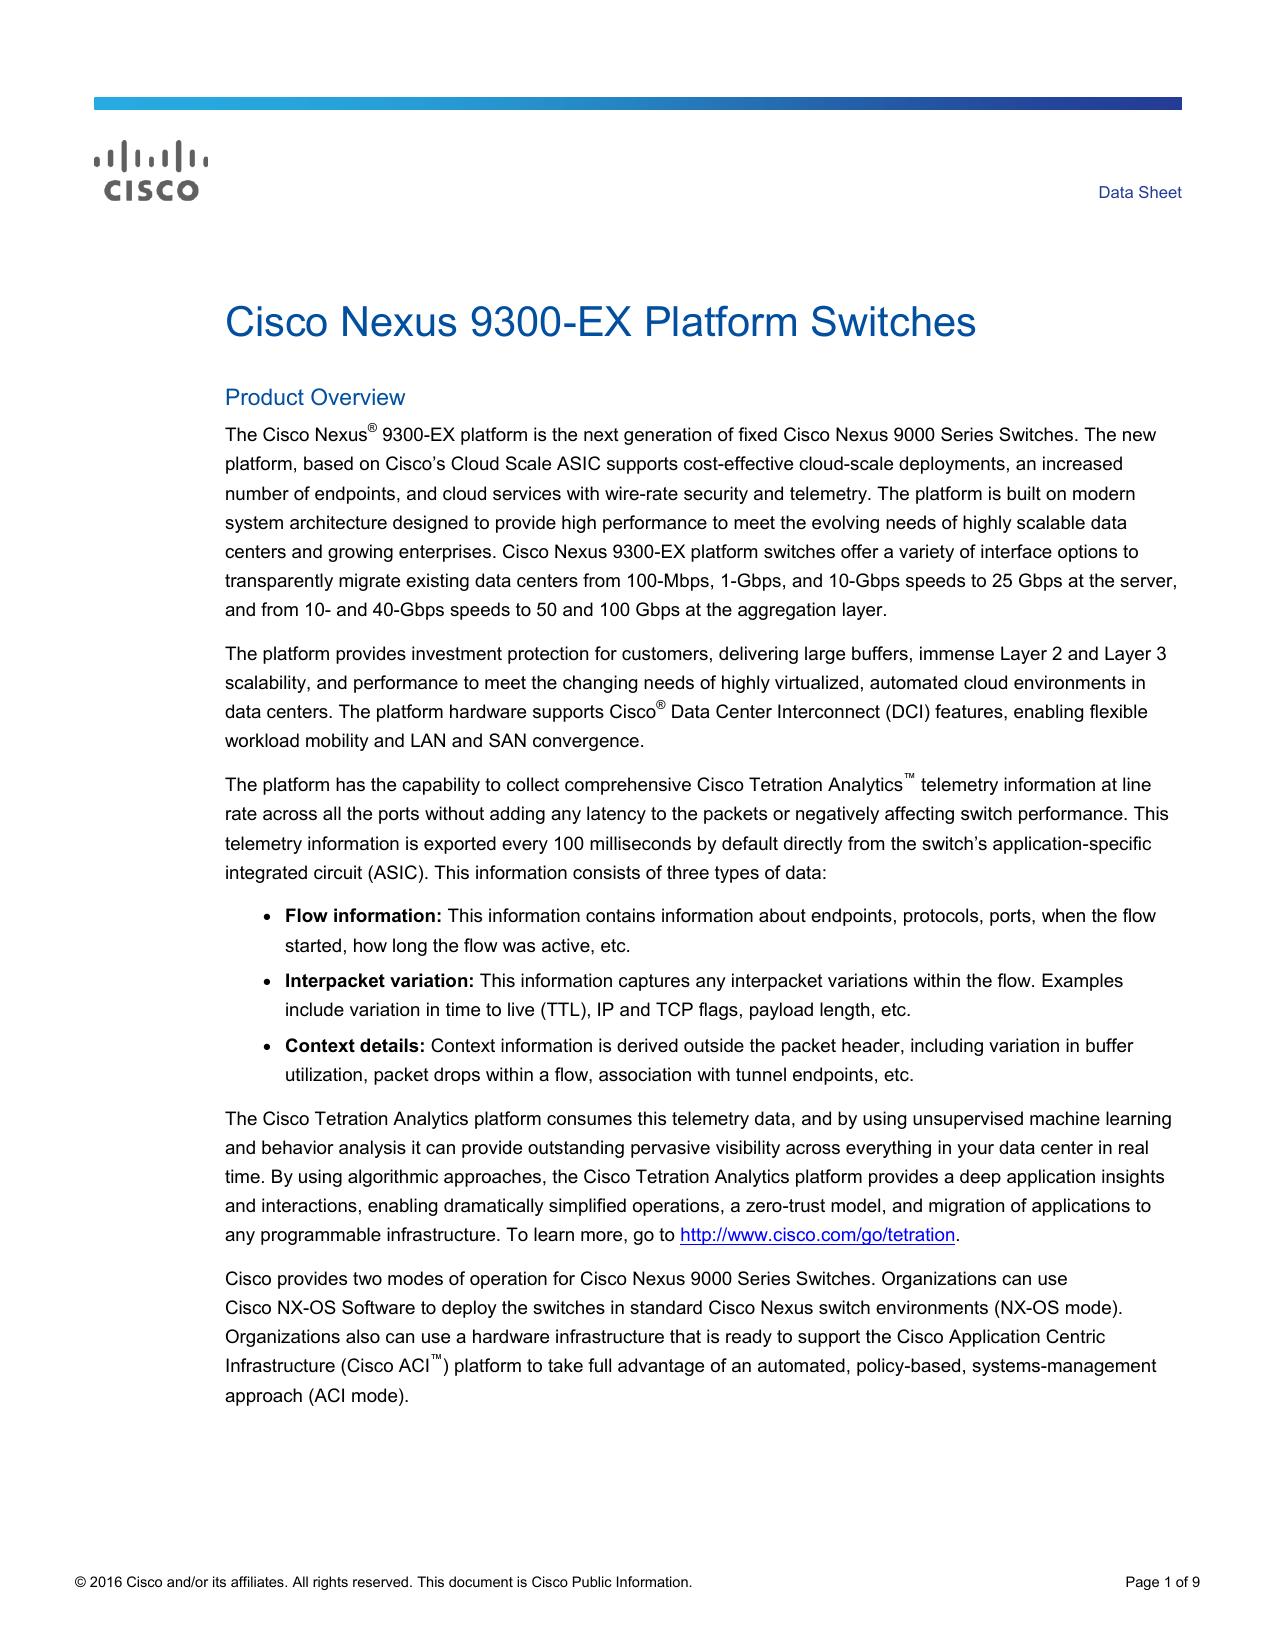 Cisco Nexus 9300-EX Platform Switches Data Sheet | manualzz com